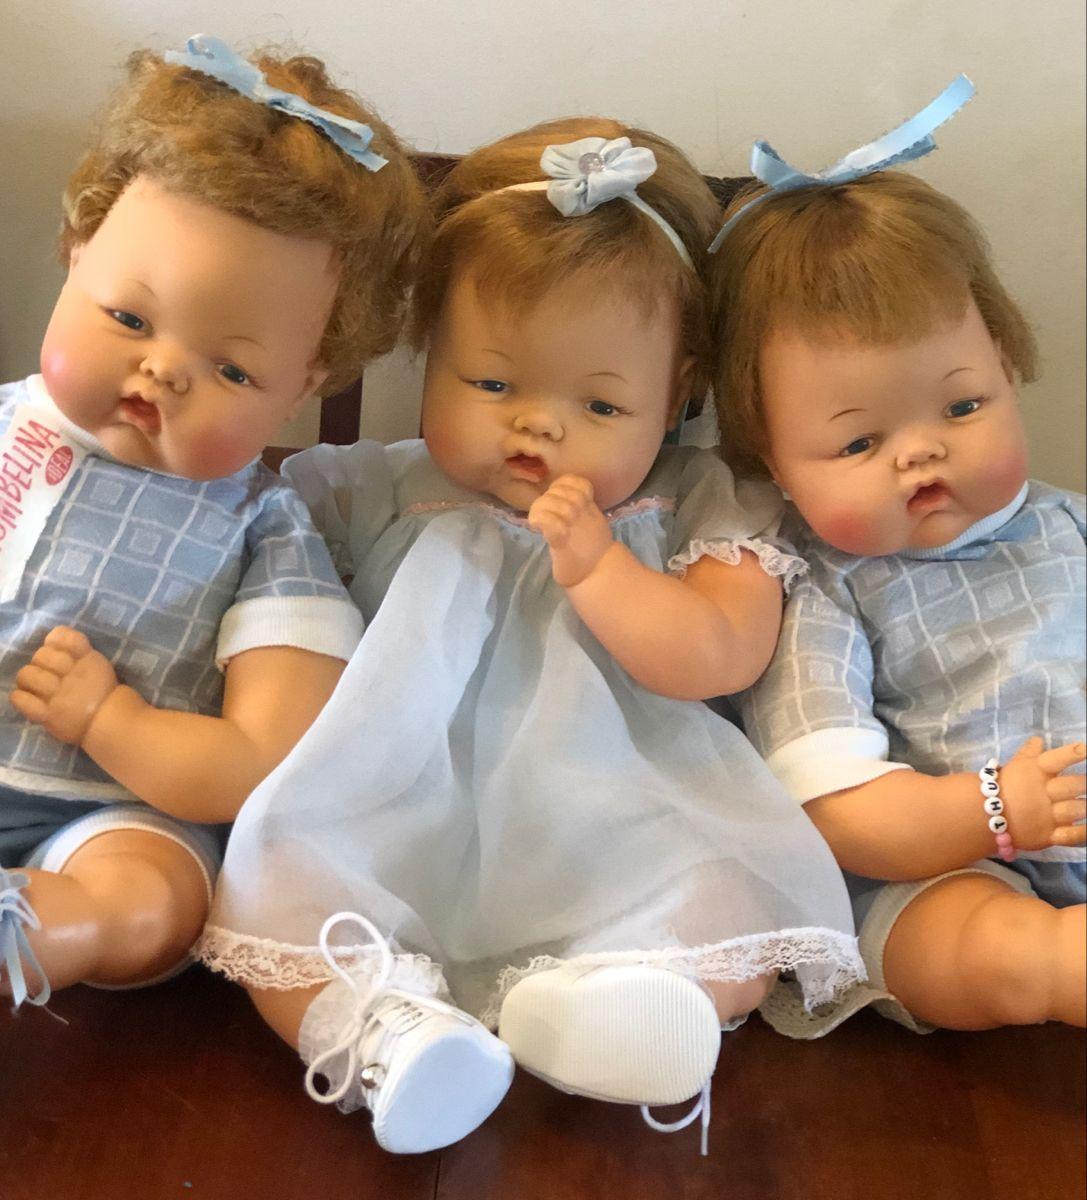 Thumbelina Dolls 19 Inch In 2020 Vintage Dolls Beautiful Dolls Baby Dolls